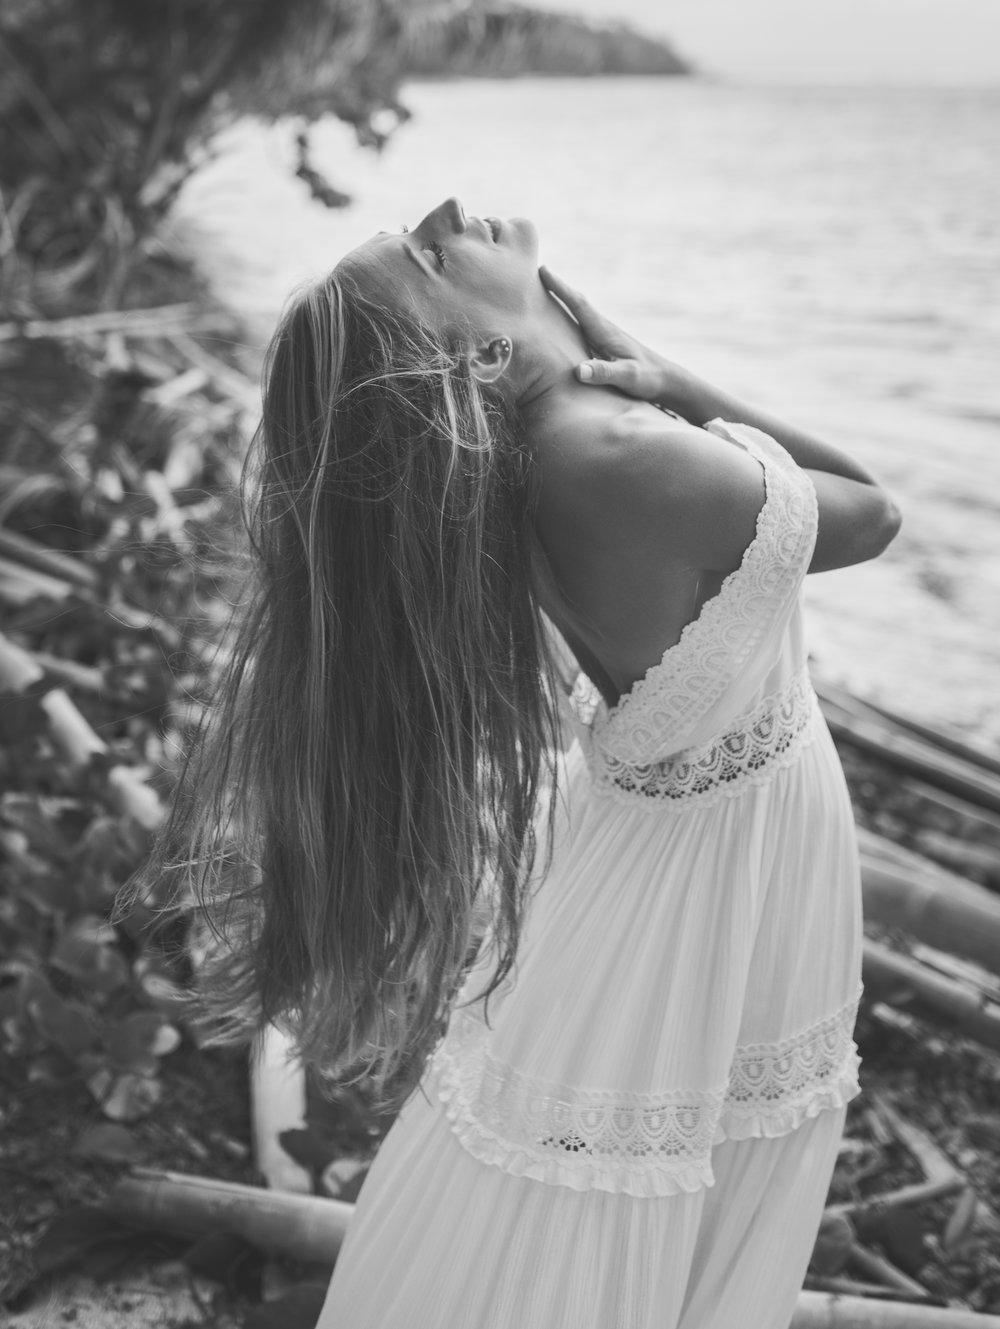 woman-guam-portrait-photographer-ipan-roxanne-augusta-7.jpg